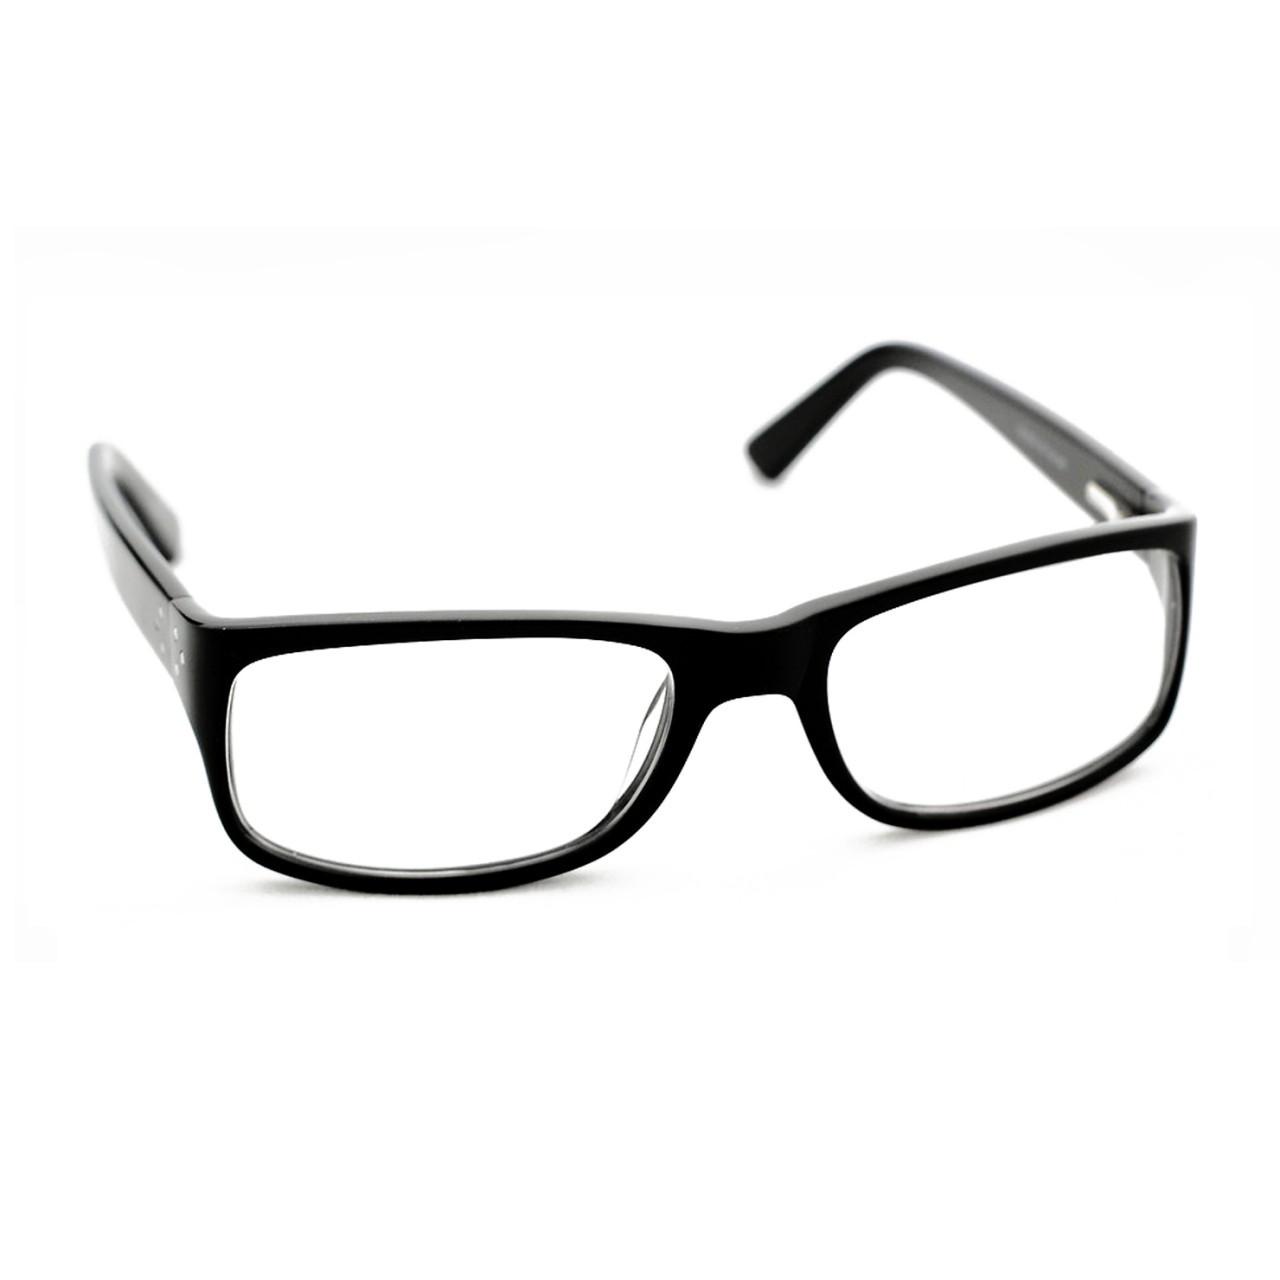 GEEK Eyewear GEEK 102